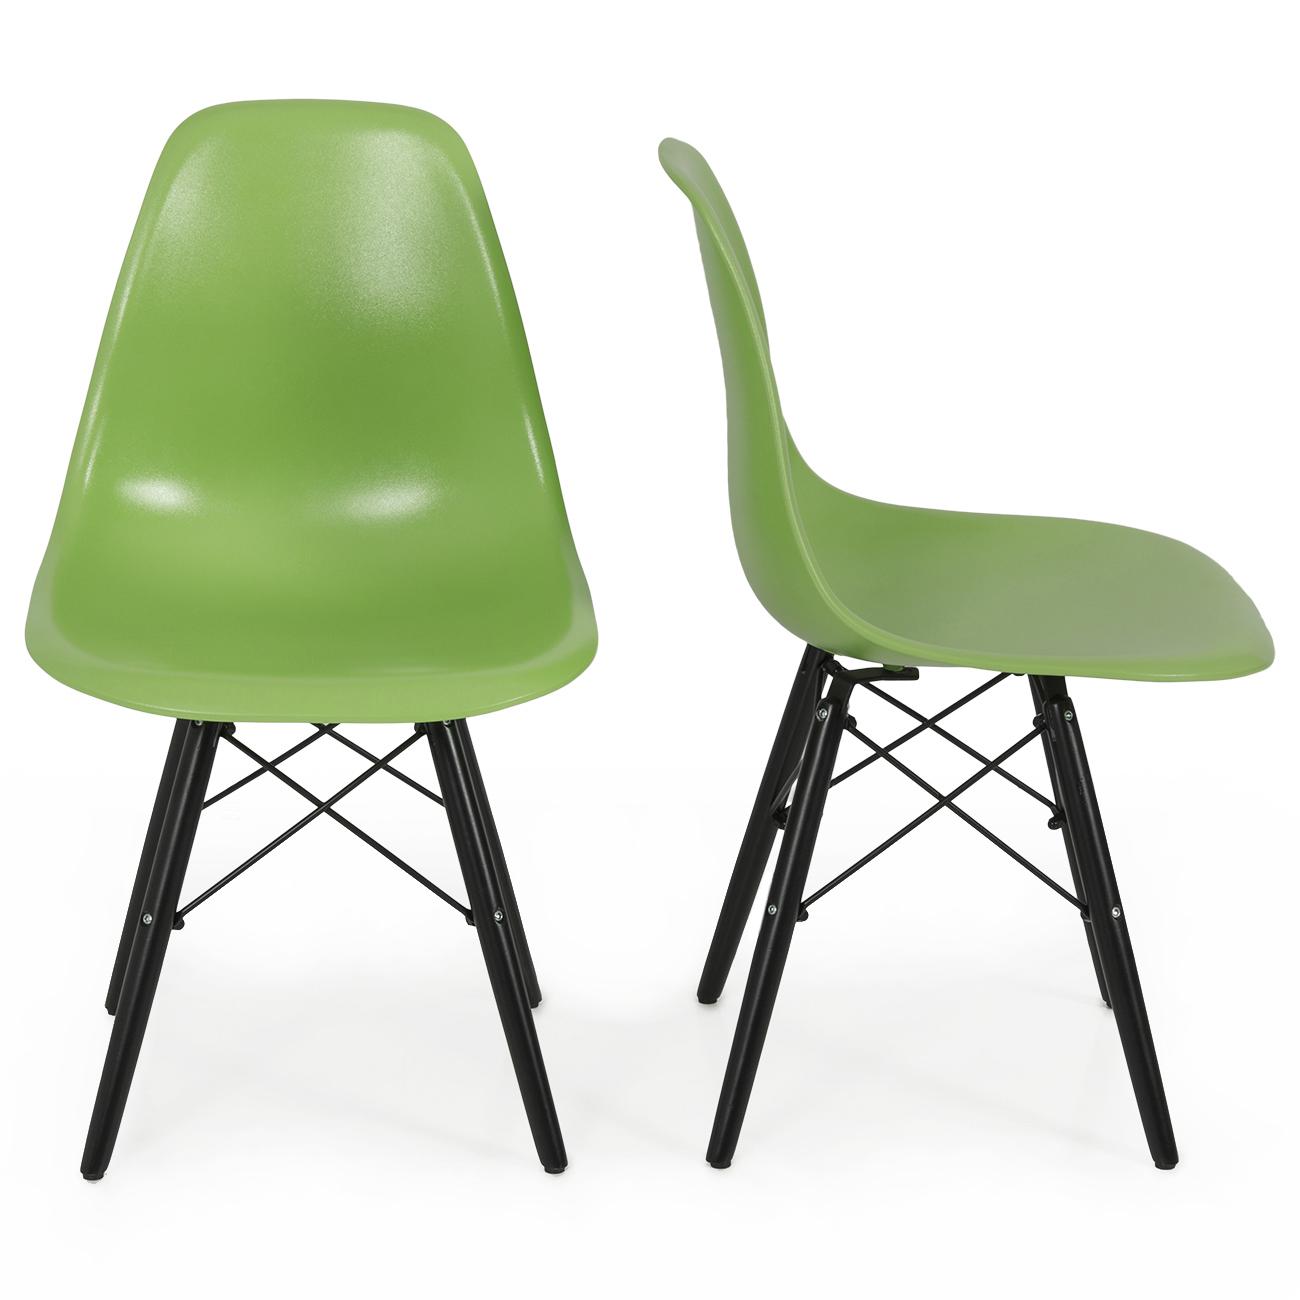 set of 2 mid century eames style dsw eiffel side chair dowel black wood base ebay. Black Bedroom Furniture Sets. Home Design Ideas